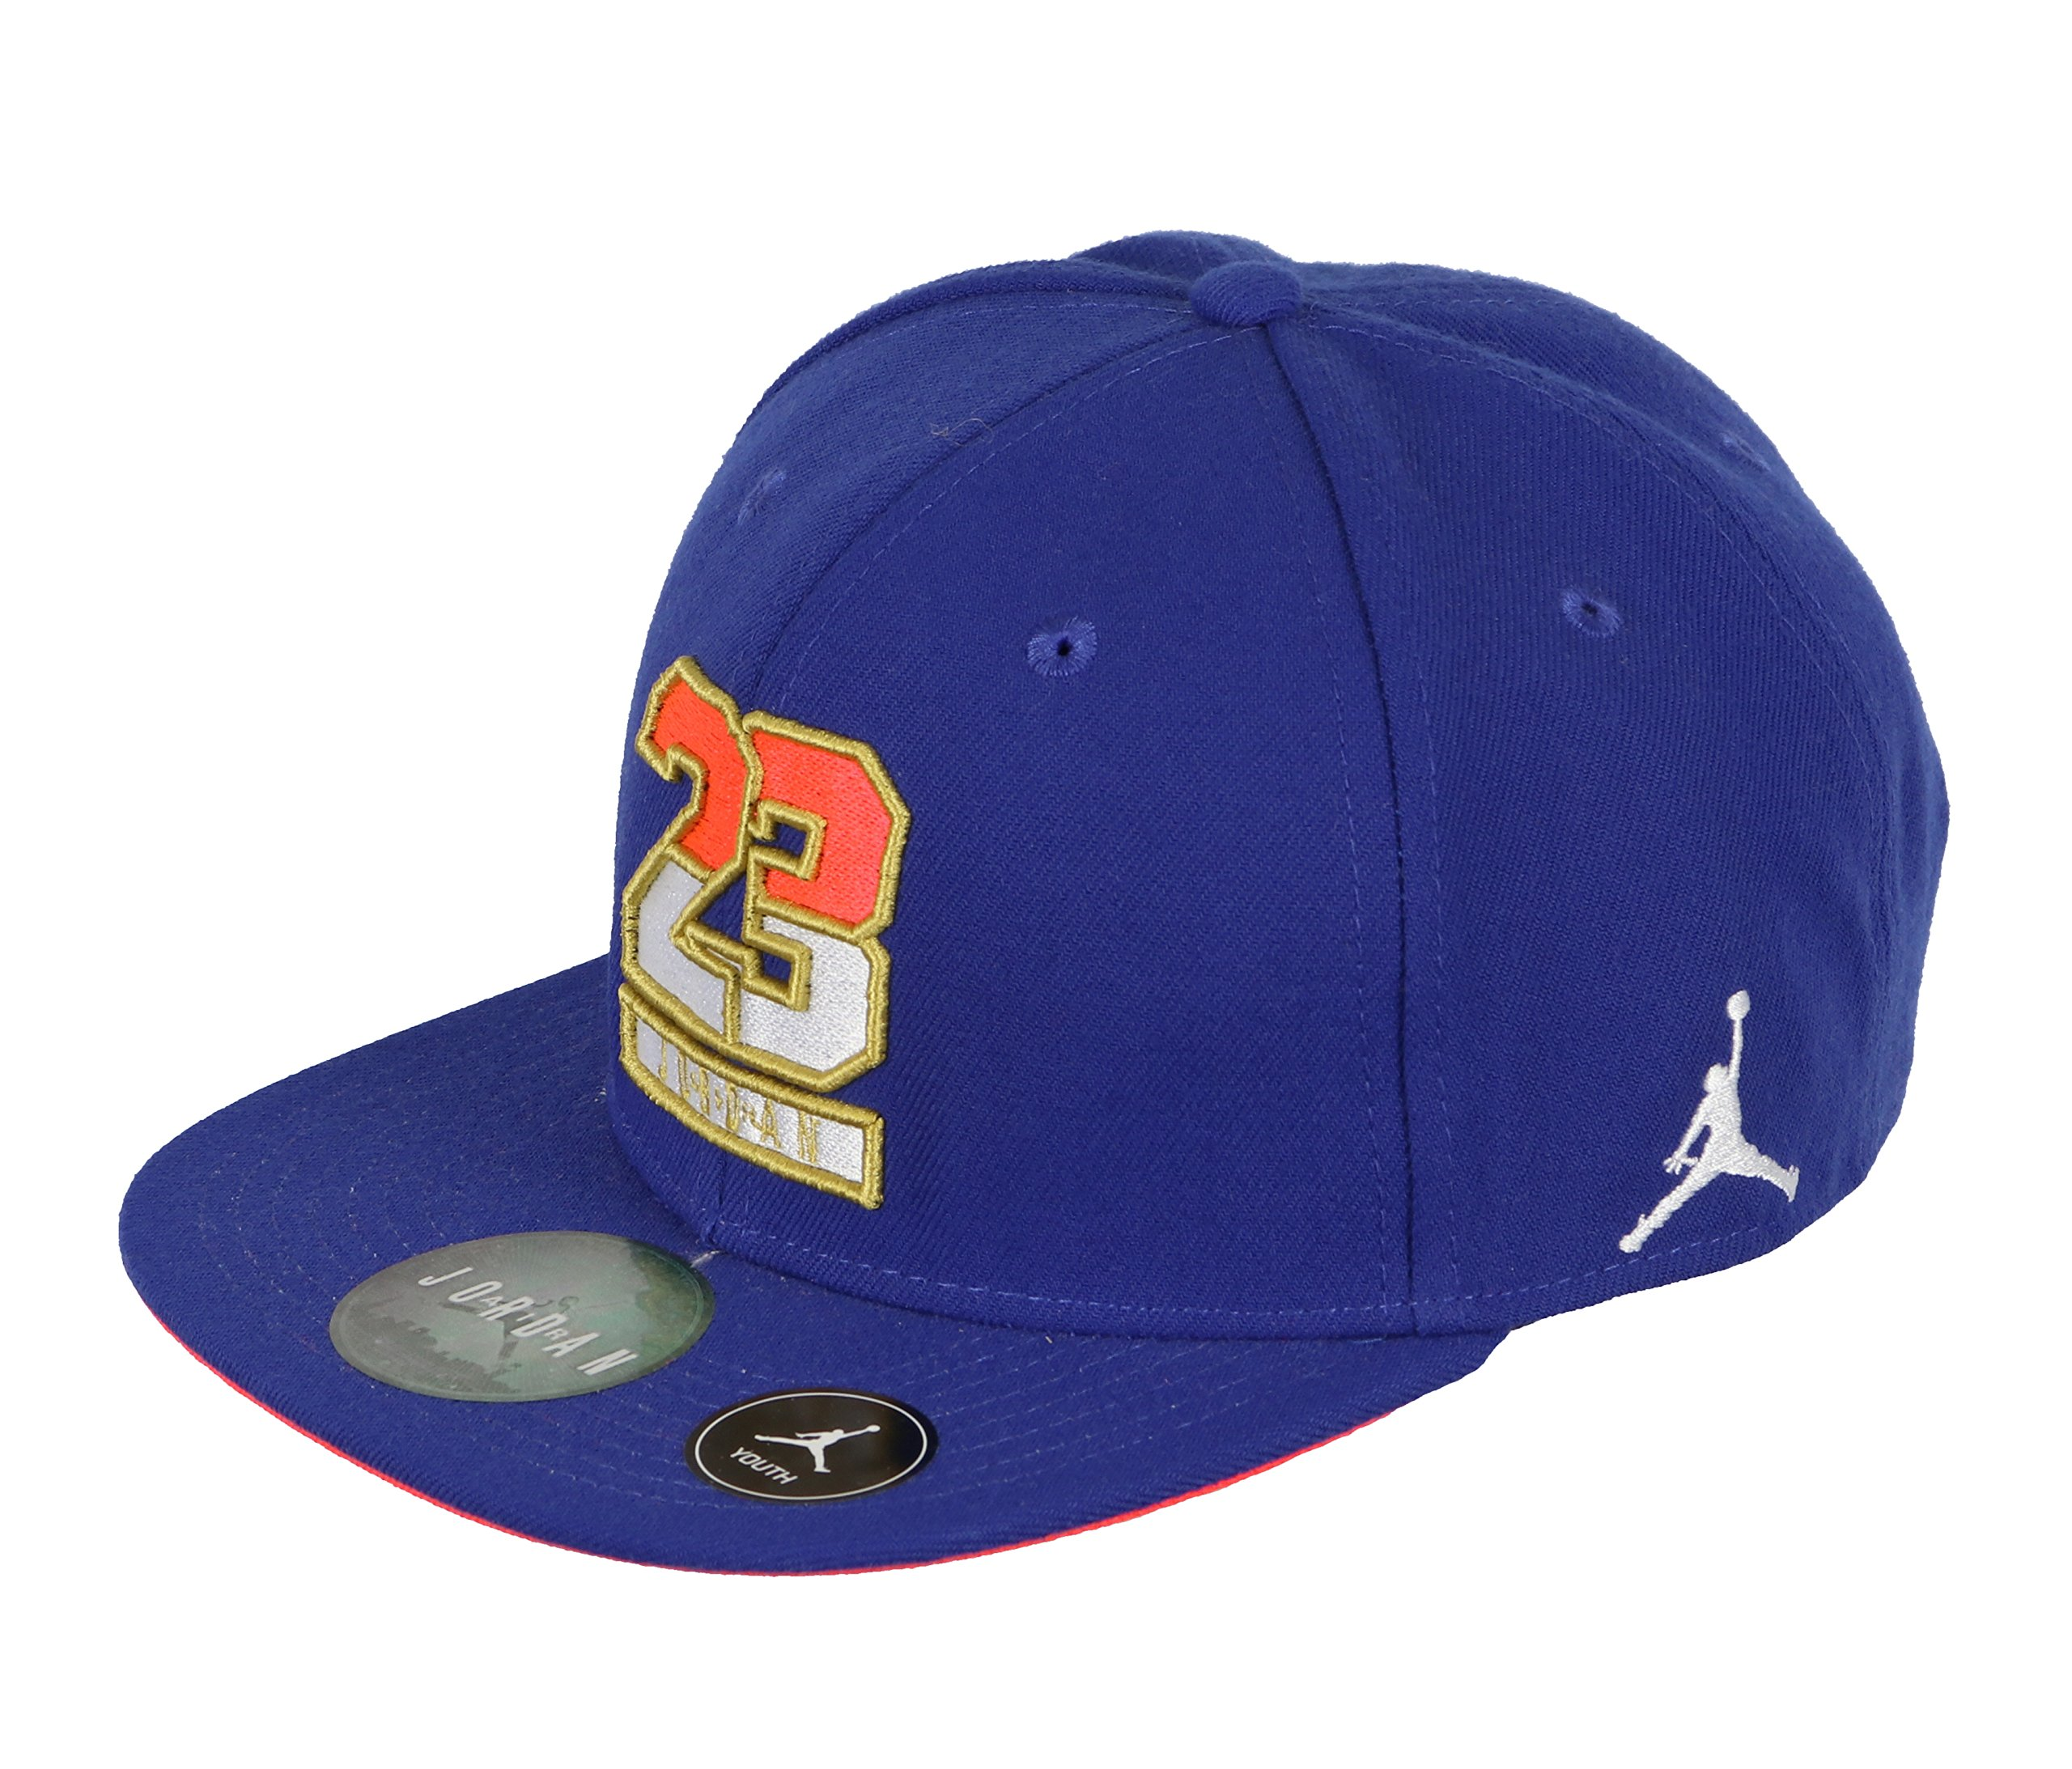 Jordan Kid's Retro VII Dream Snapback Cap Royal Blue